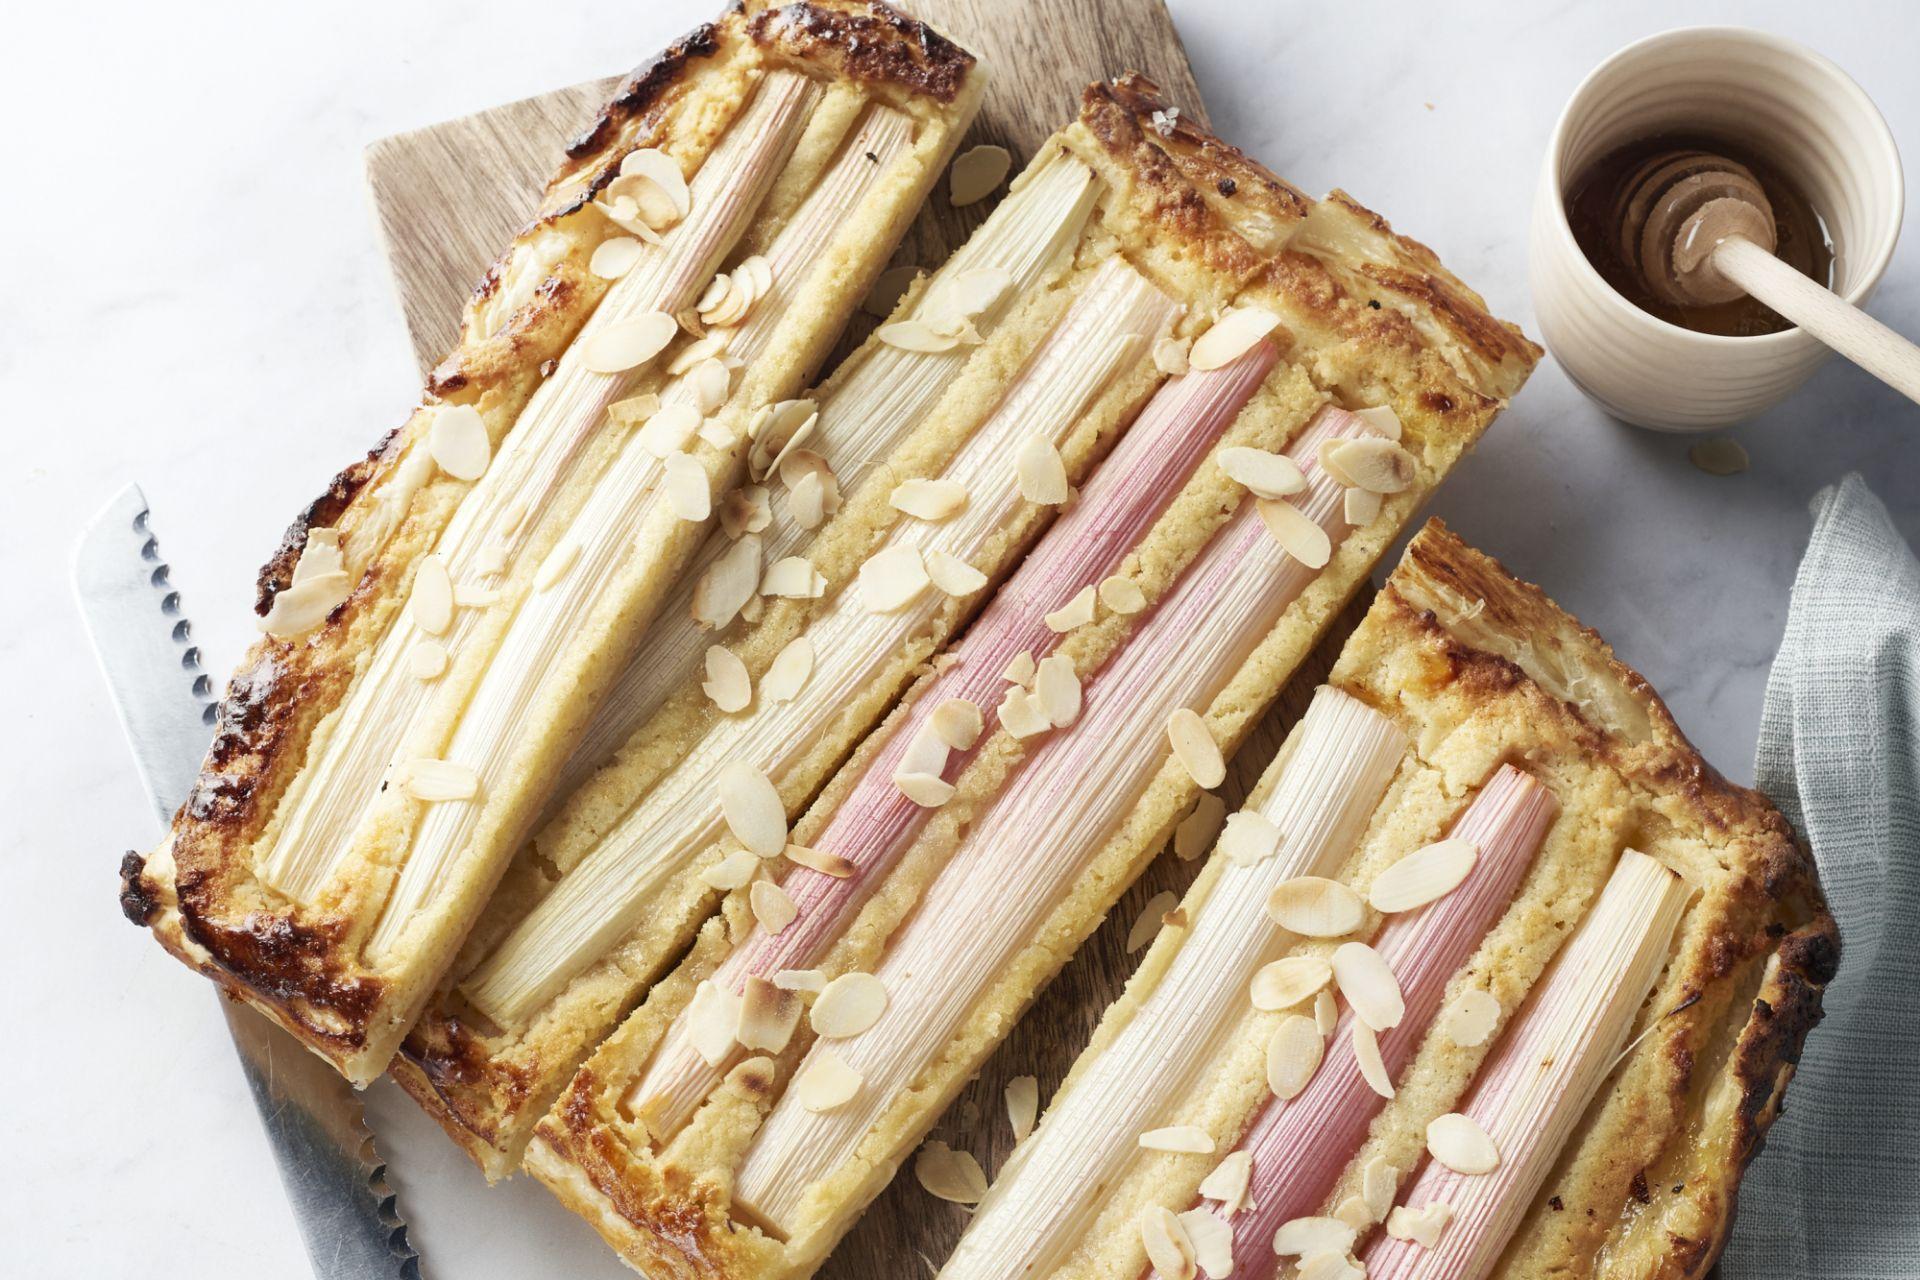 Rabarber-franchipane taart